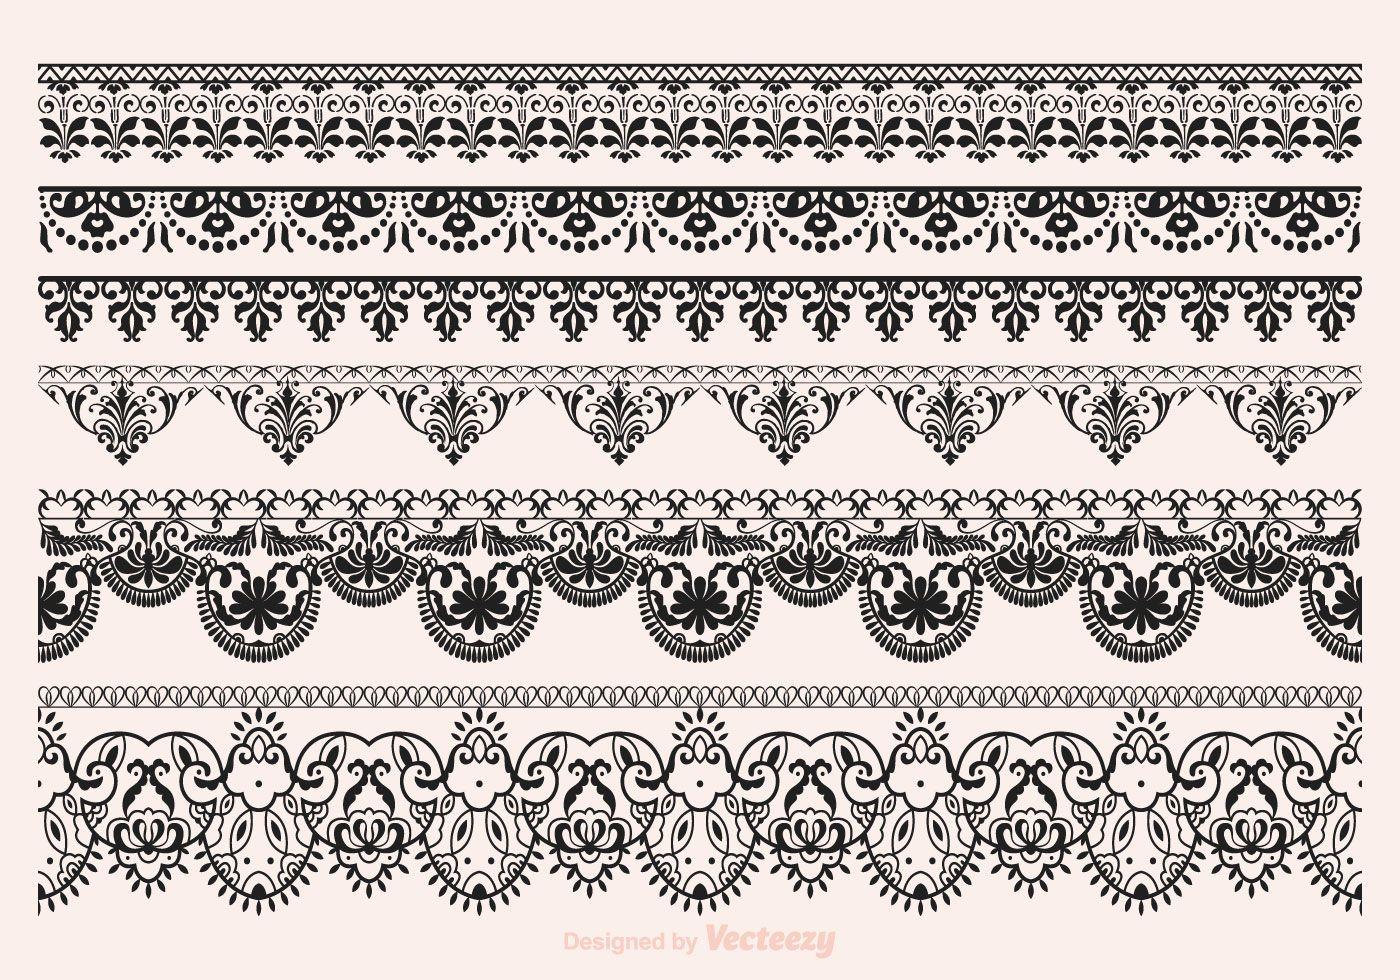 Free Vector Lace Vector Borders | Paint-Plpatt/mud 25 | Pinterest - Free Printable Lace Stencil